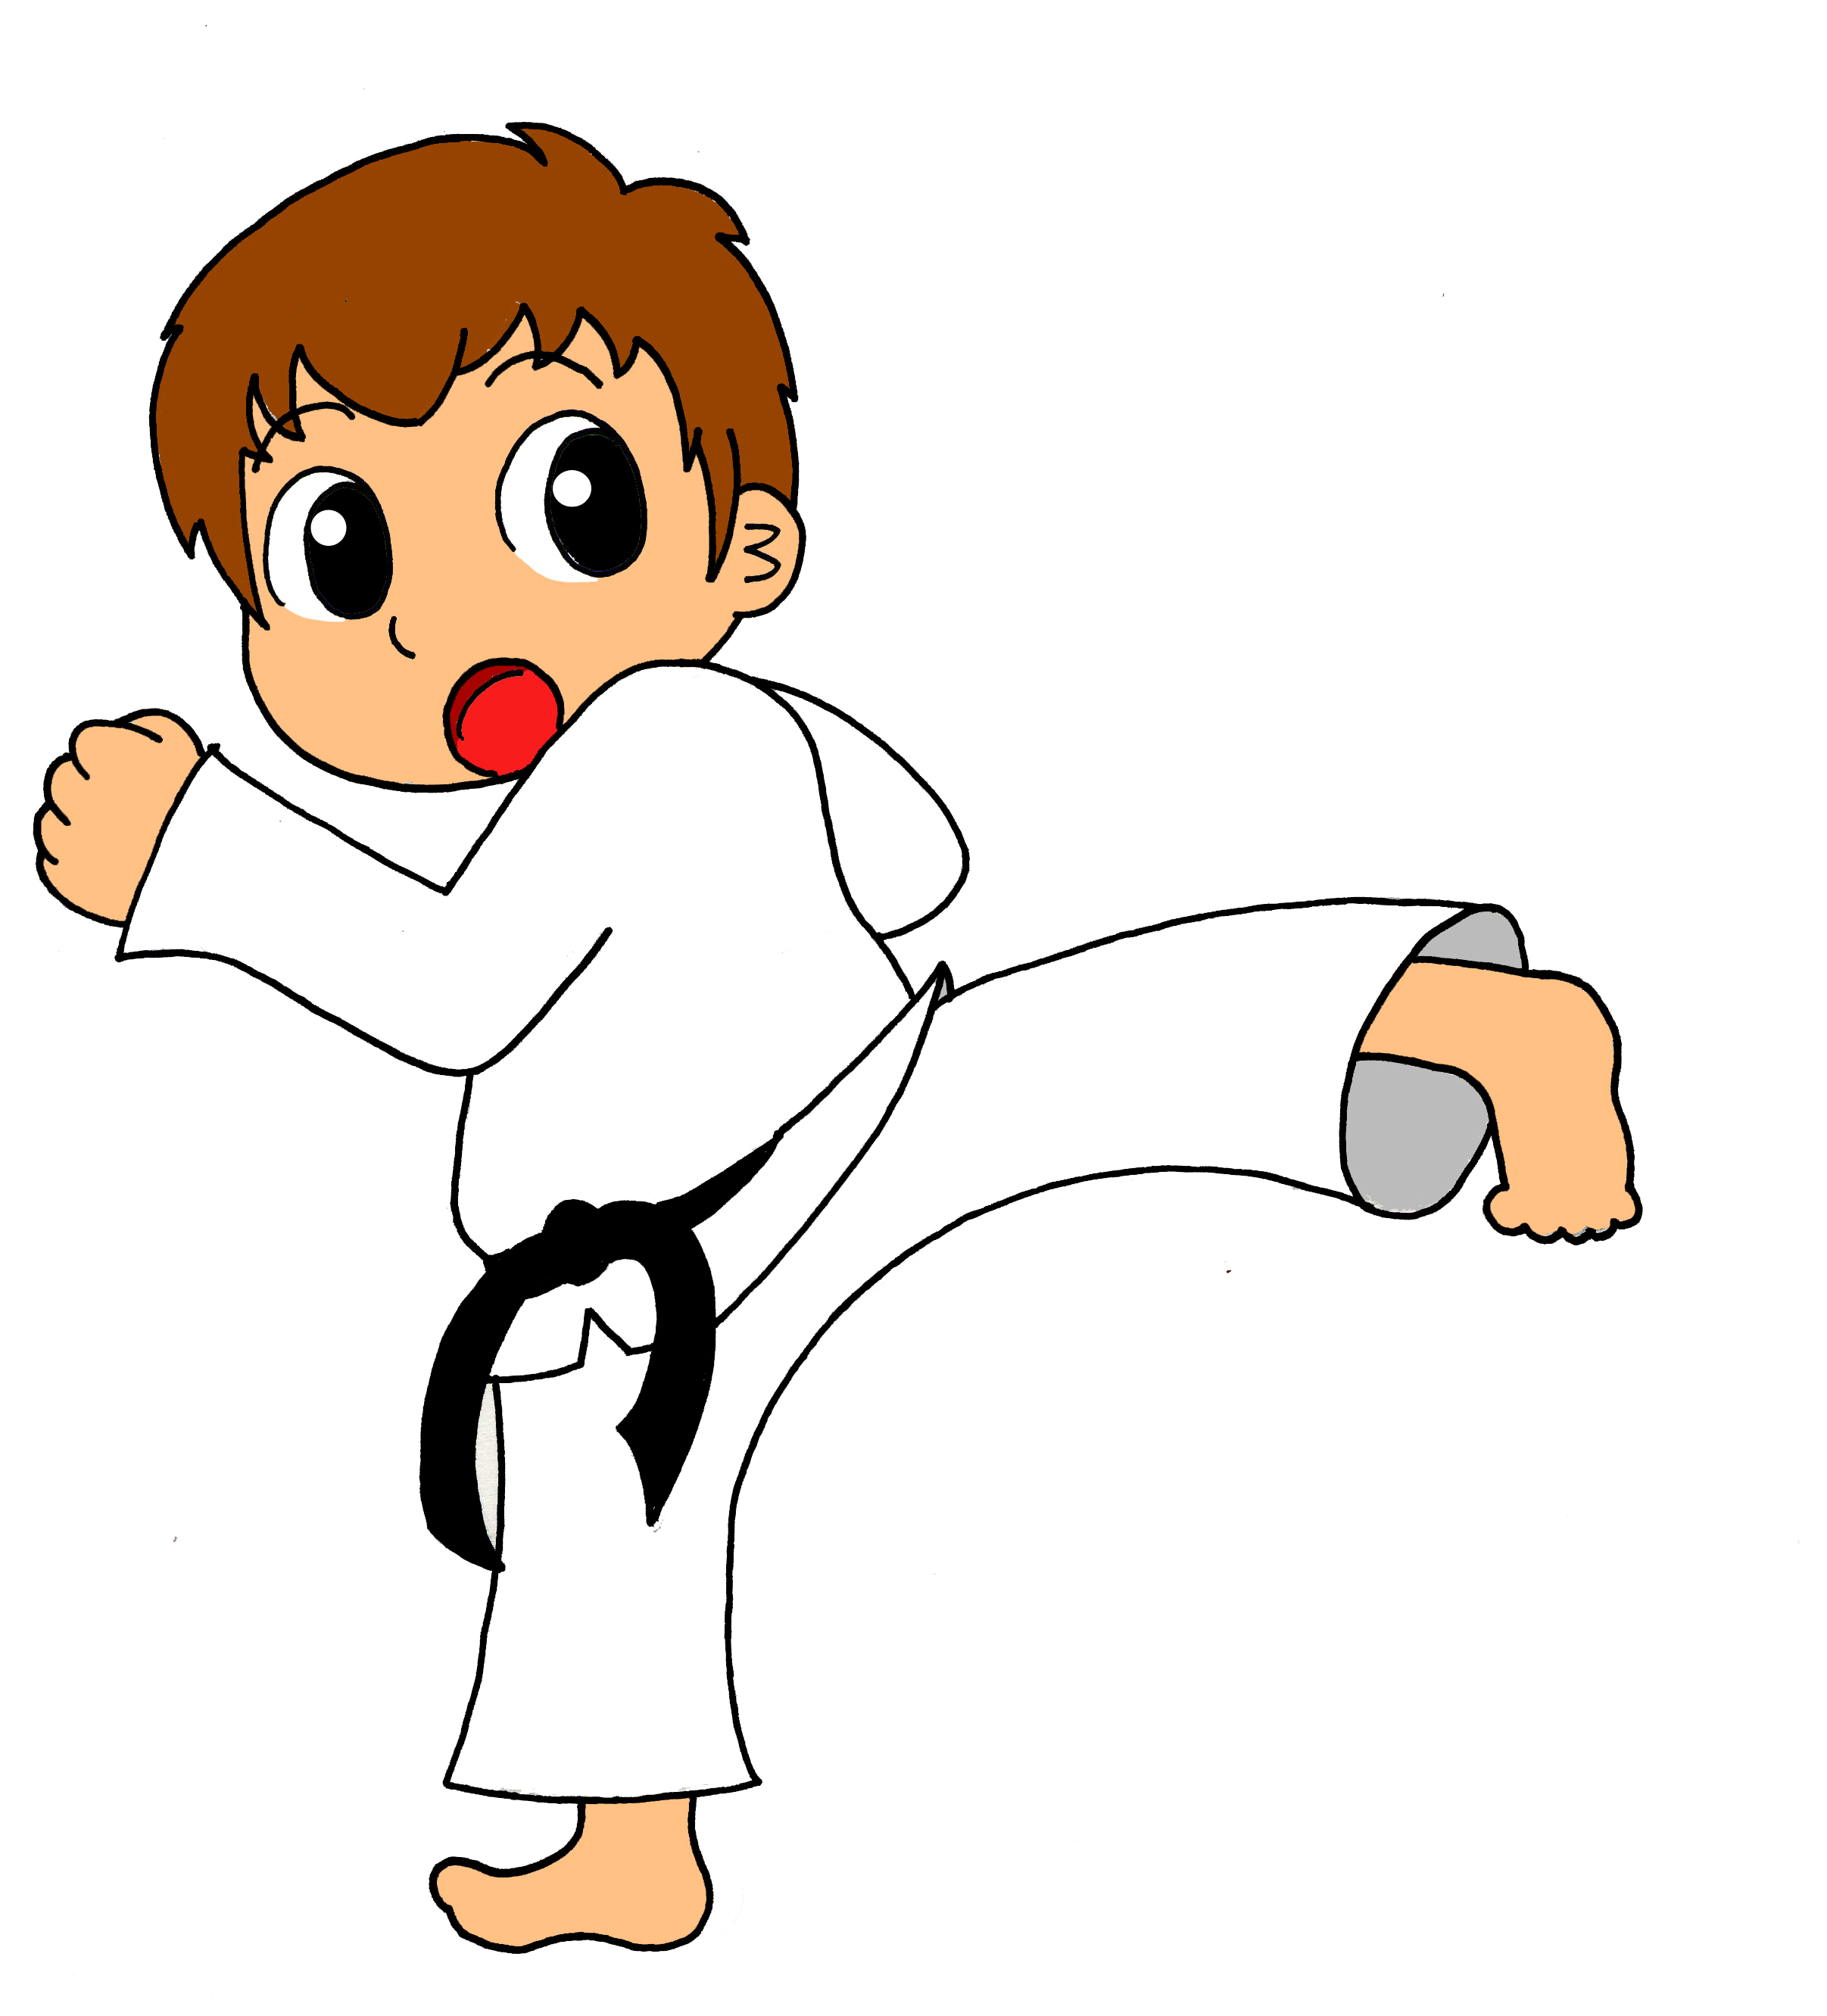 Pictures Taekwondo Videos Taekwondo Video Codes Taekwondo Vid Clips